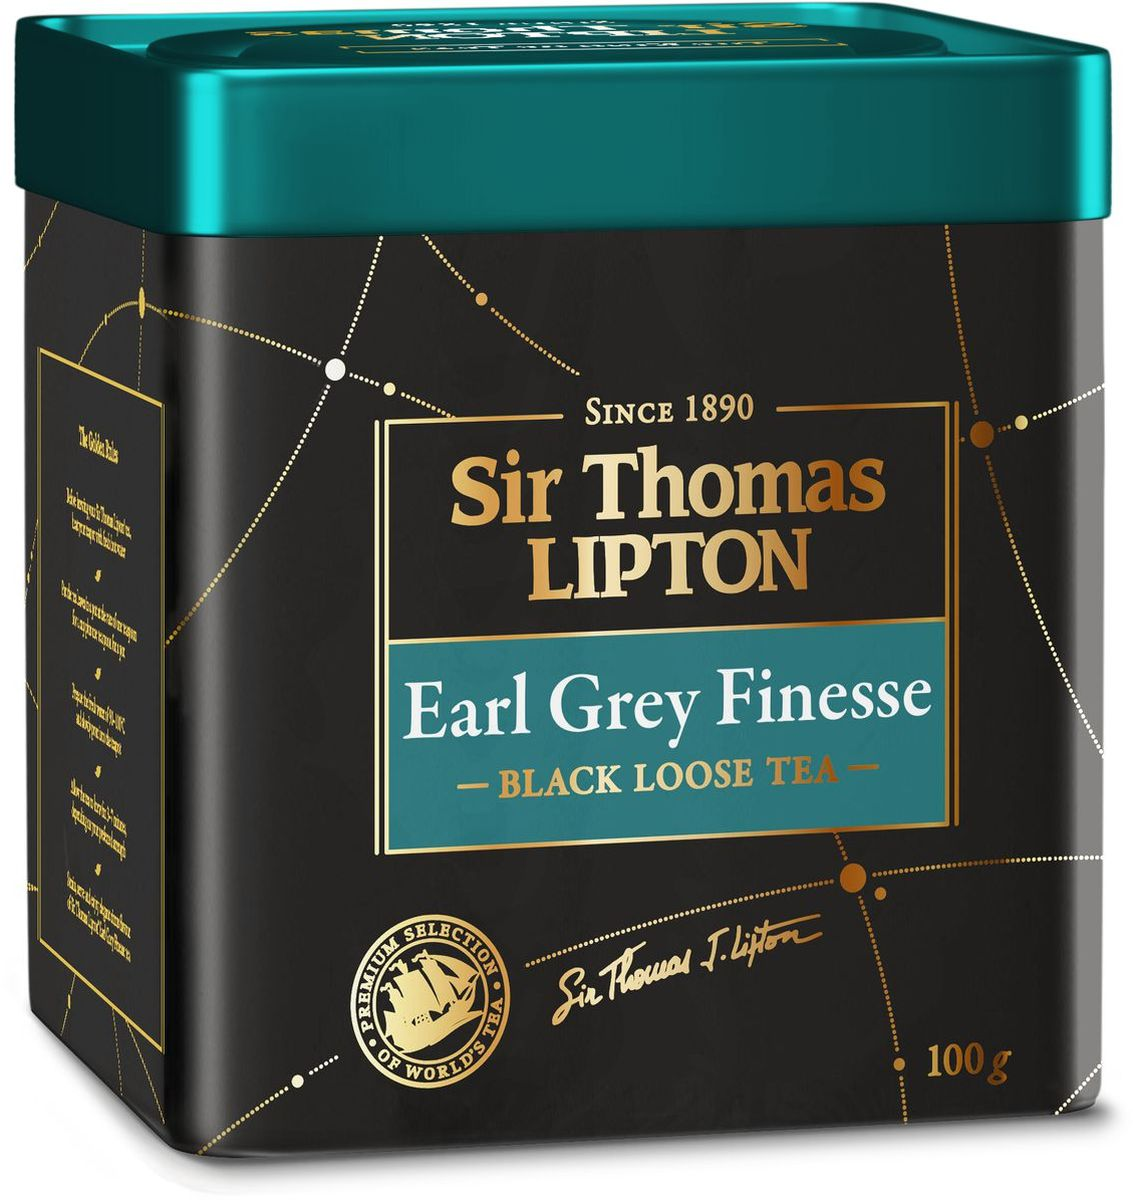 Sir Thomas Lipton Earl Grey Finesse чай черный ароматизированный, 100 г greenfield royal earl grey черный листовой чай 250 г